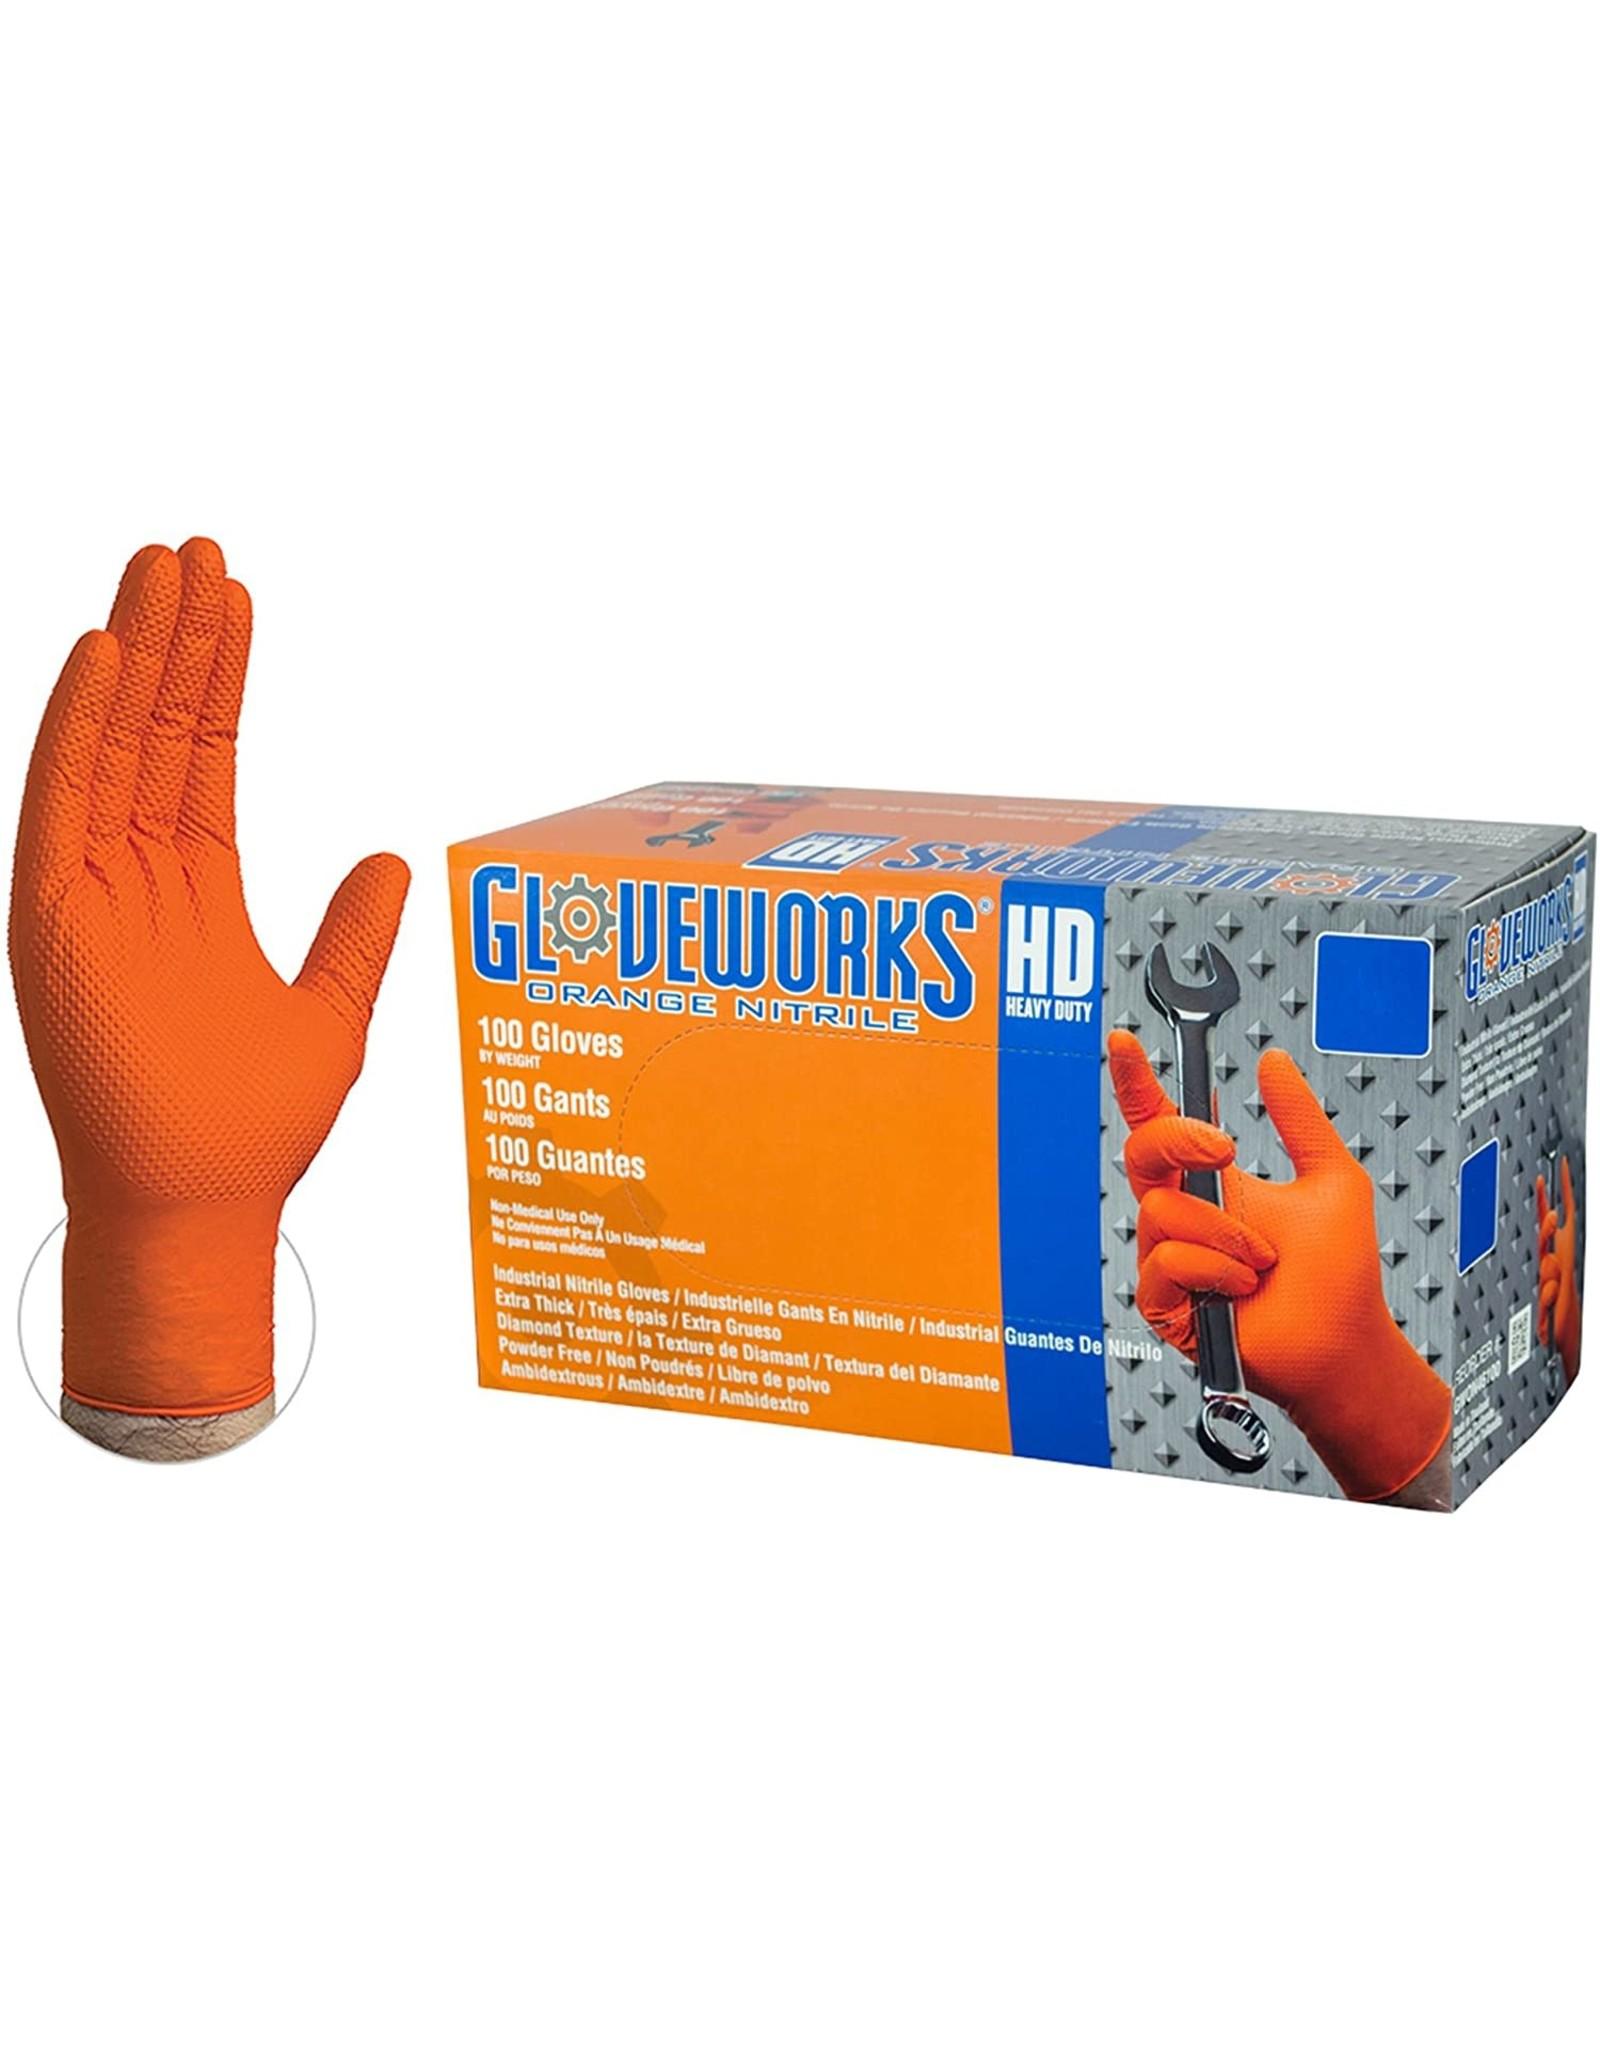 Orange Heavy Duty Nitrile Gloves (Large) 8MIL - 100 pack